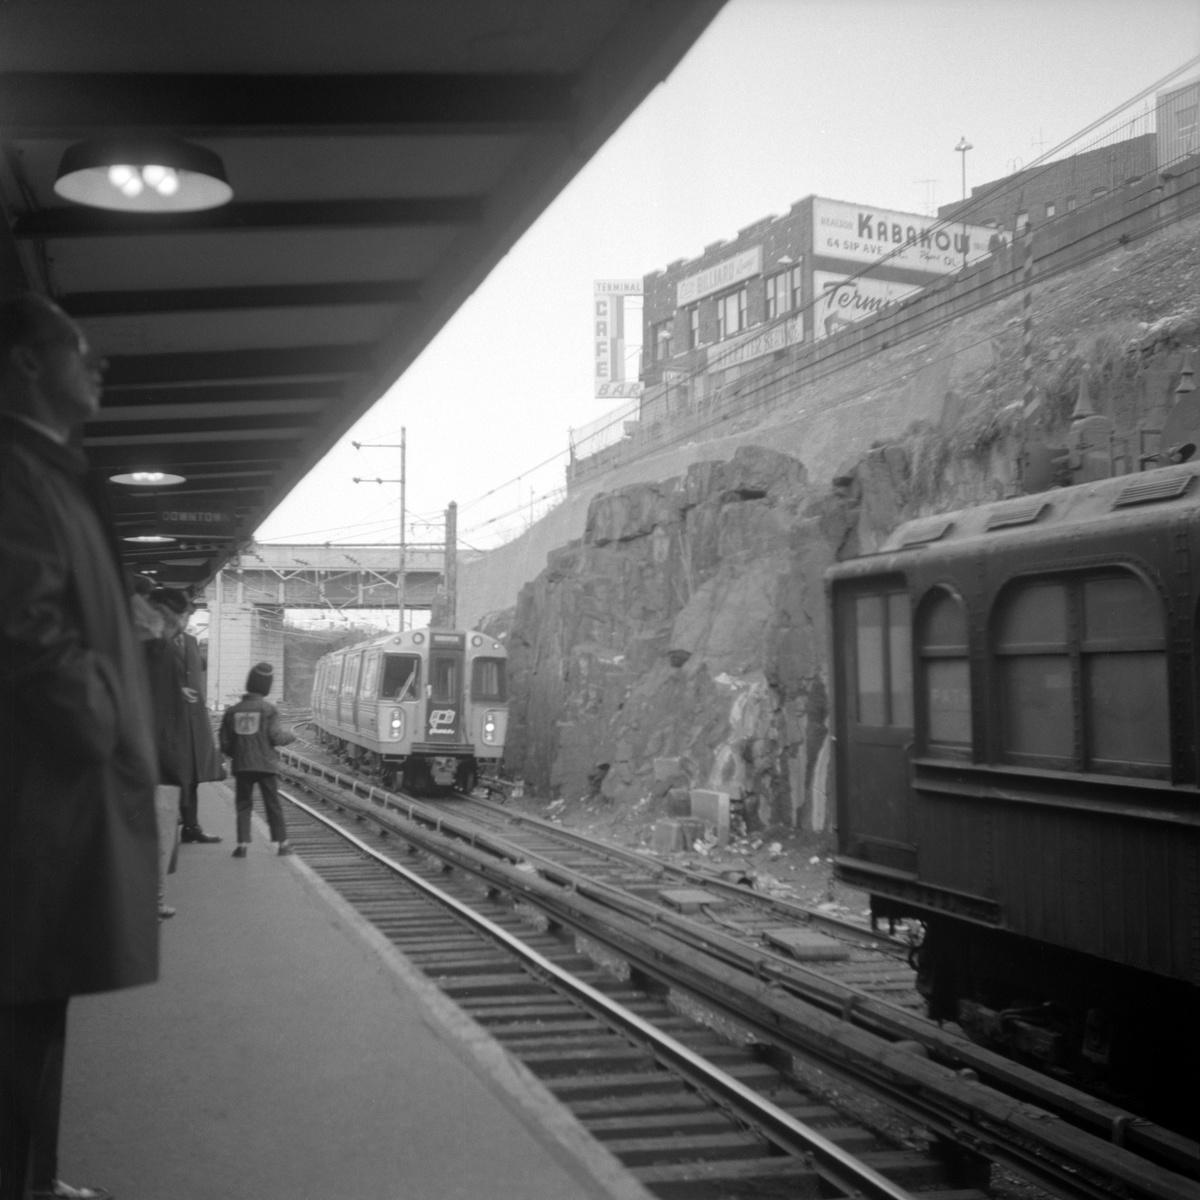 (342k, 1200x1200)<br><b>Country:</b> United States<br><b>City:</b> Jersey City, NJ<br><b>System:</b> PATH<br><b>Location:</b> Journal Square<br><b>Car:</b> PATH PA-1 (St. Louis Car, 1965)  <br><b>Collection of:</b> David Pirmann<br><b>Date:</b> 4/23/1967<br><b>Viewed (this week/total):</b> 3 / 55